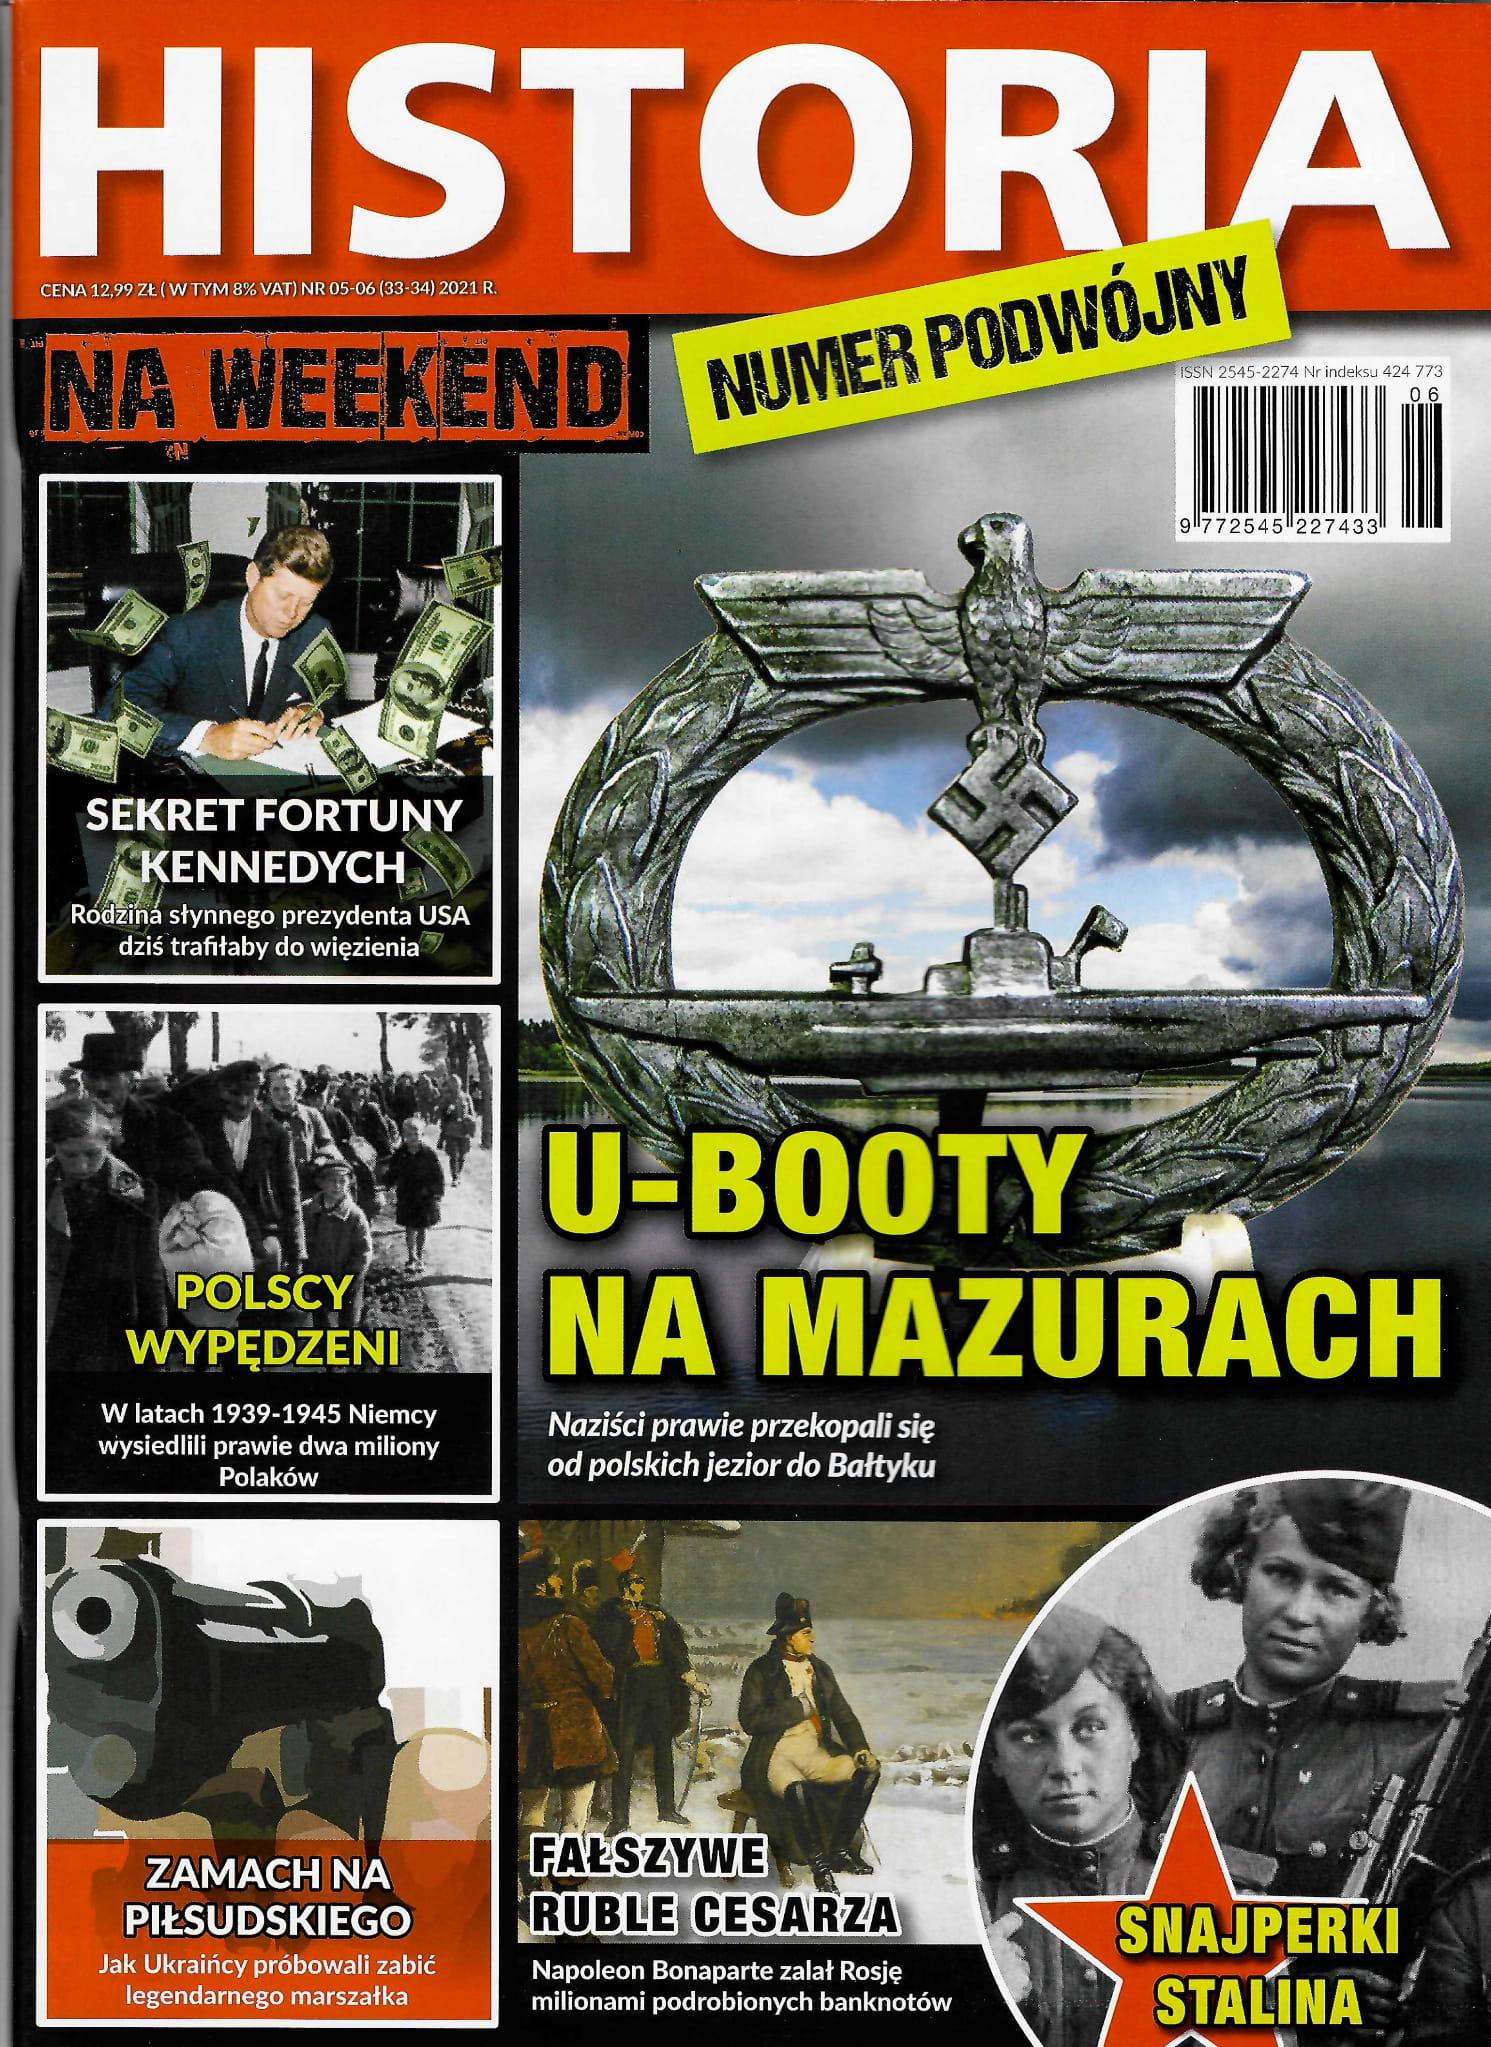 Historia na weekend nr 05-06 (33-34) 2021 r.